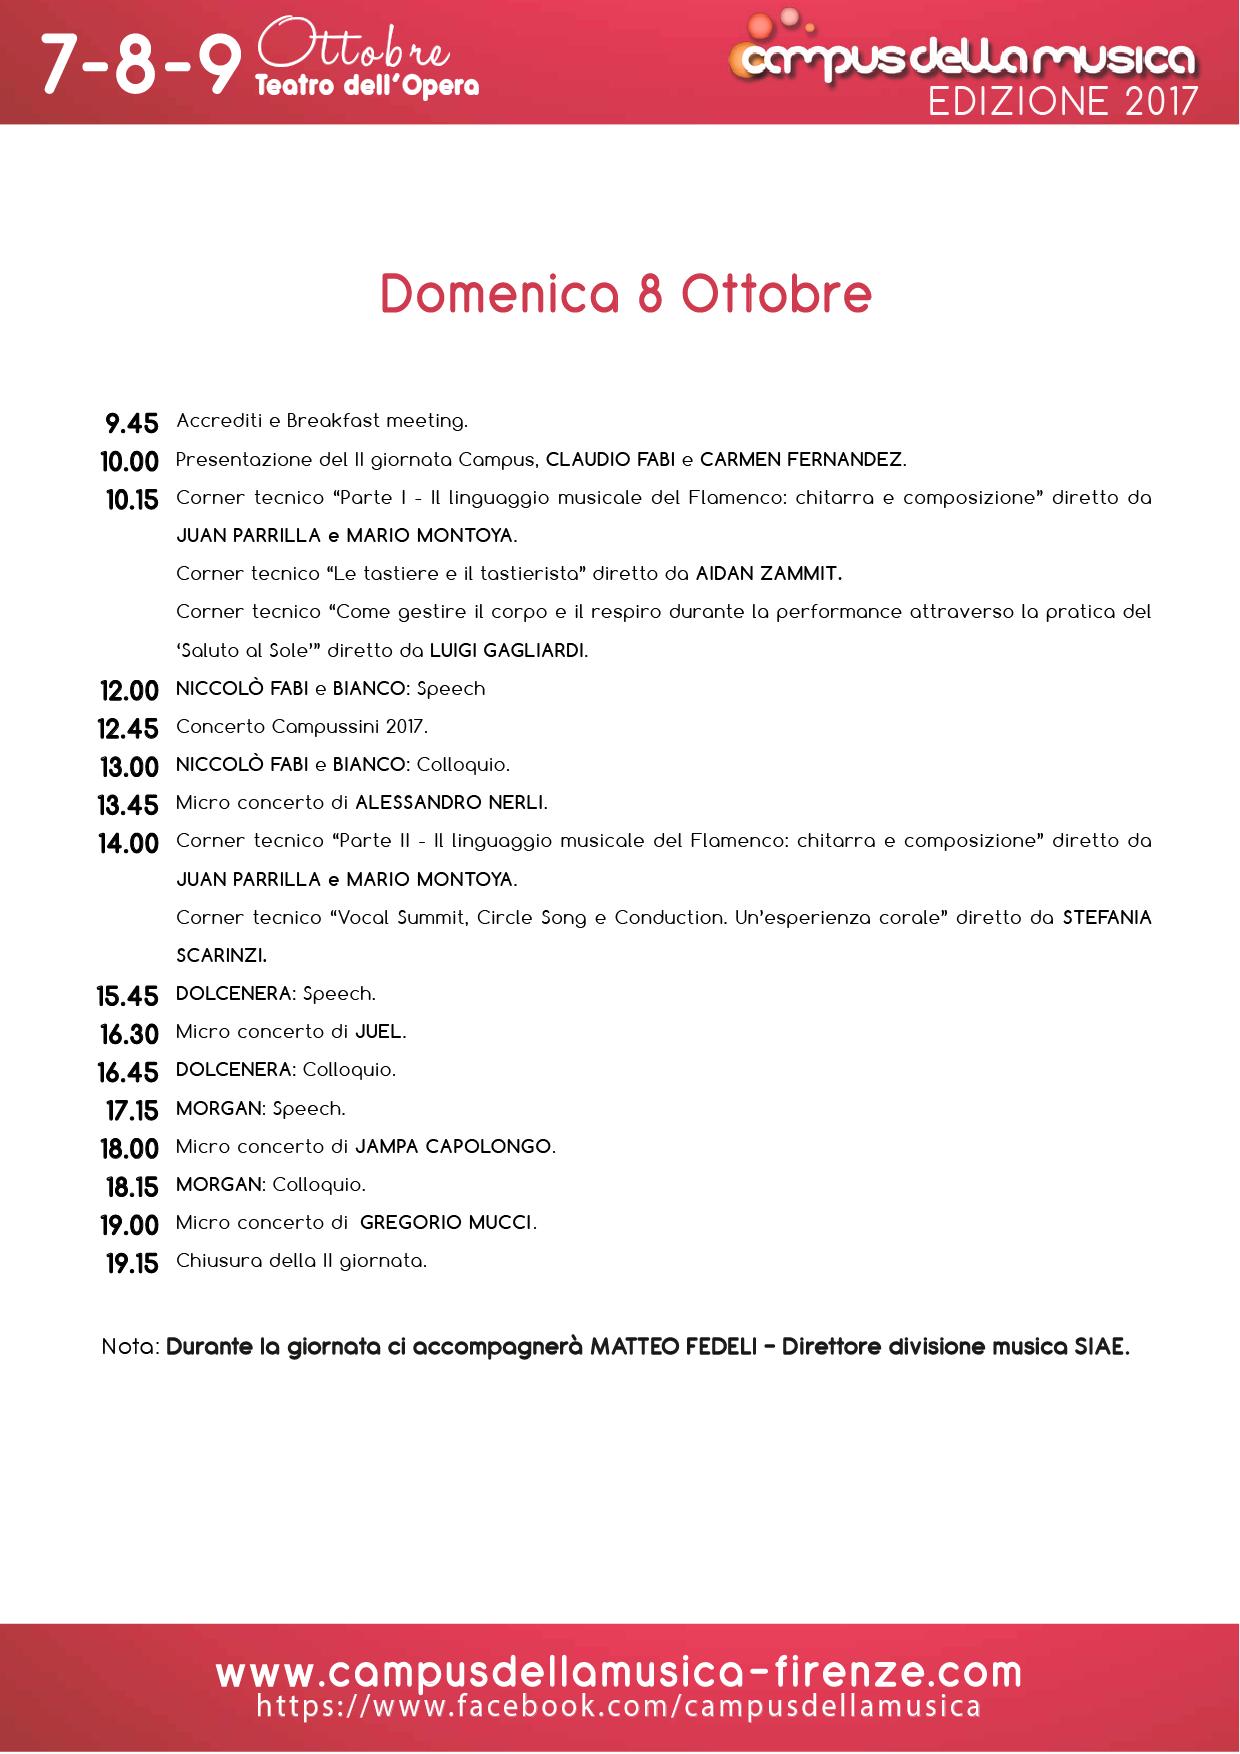 Programma 2-13